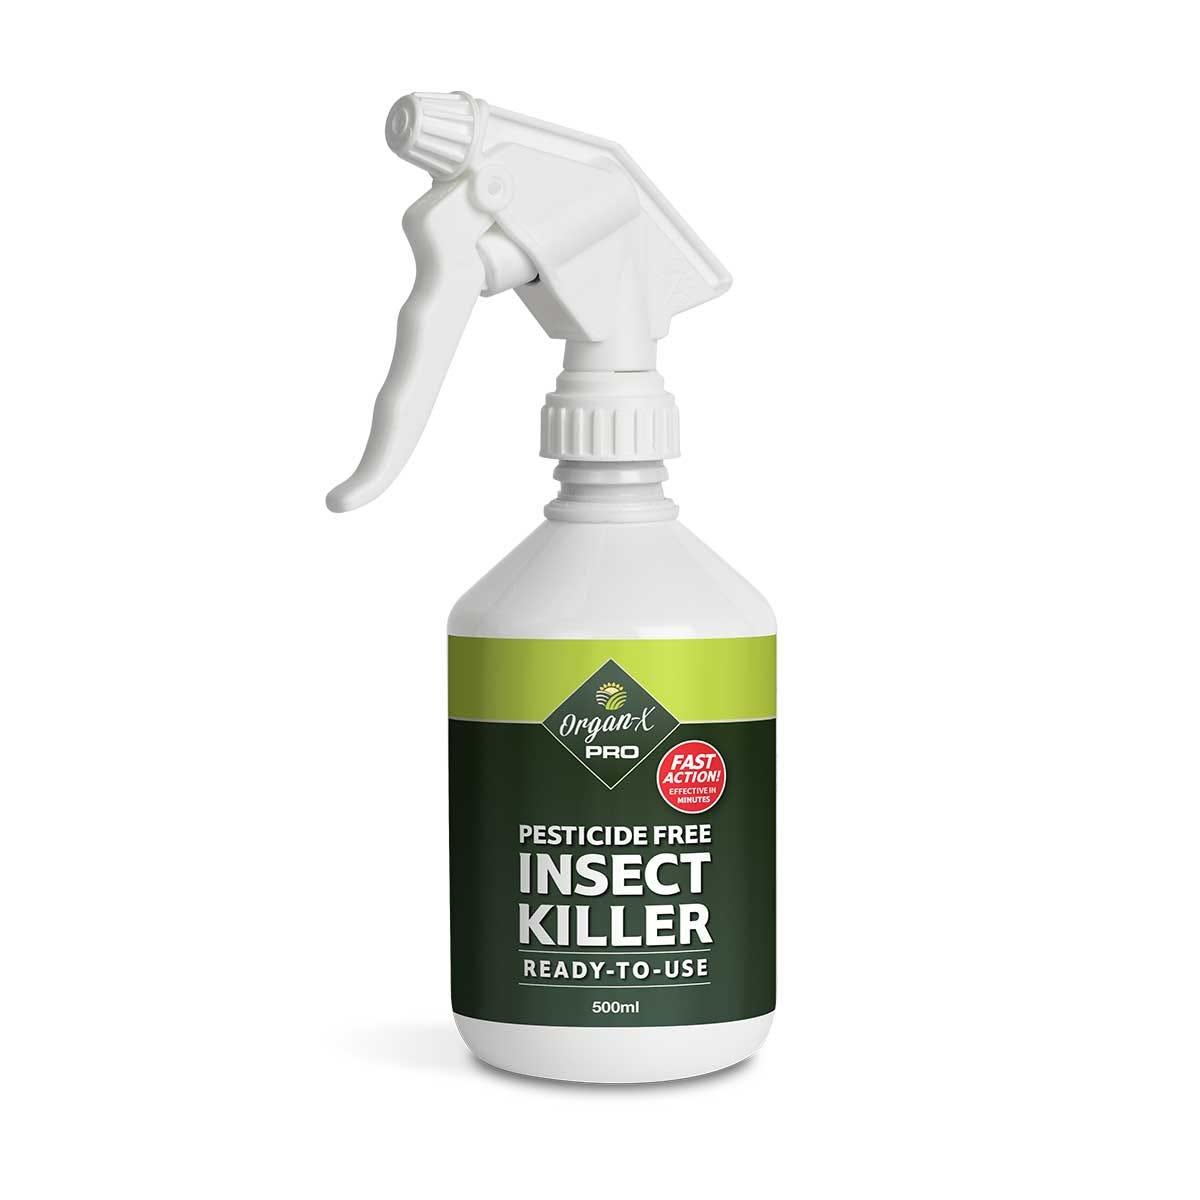 Organ-X Pro Pesticide Free Insect Killer - 500ml